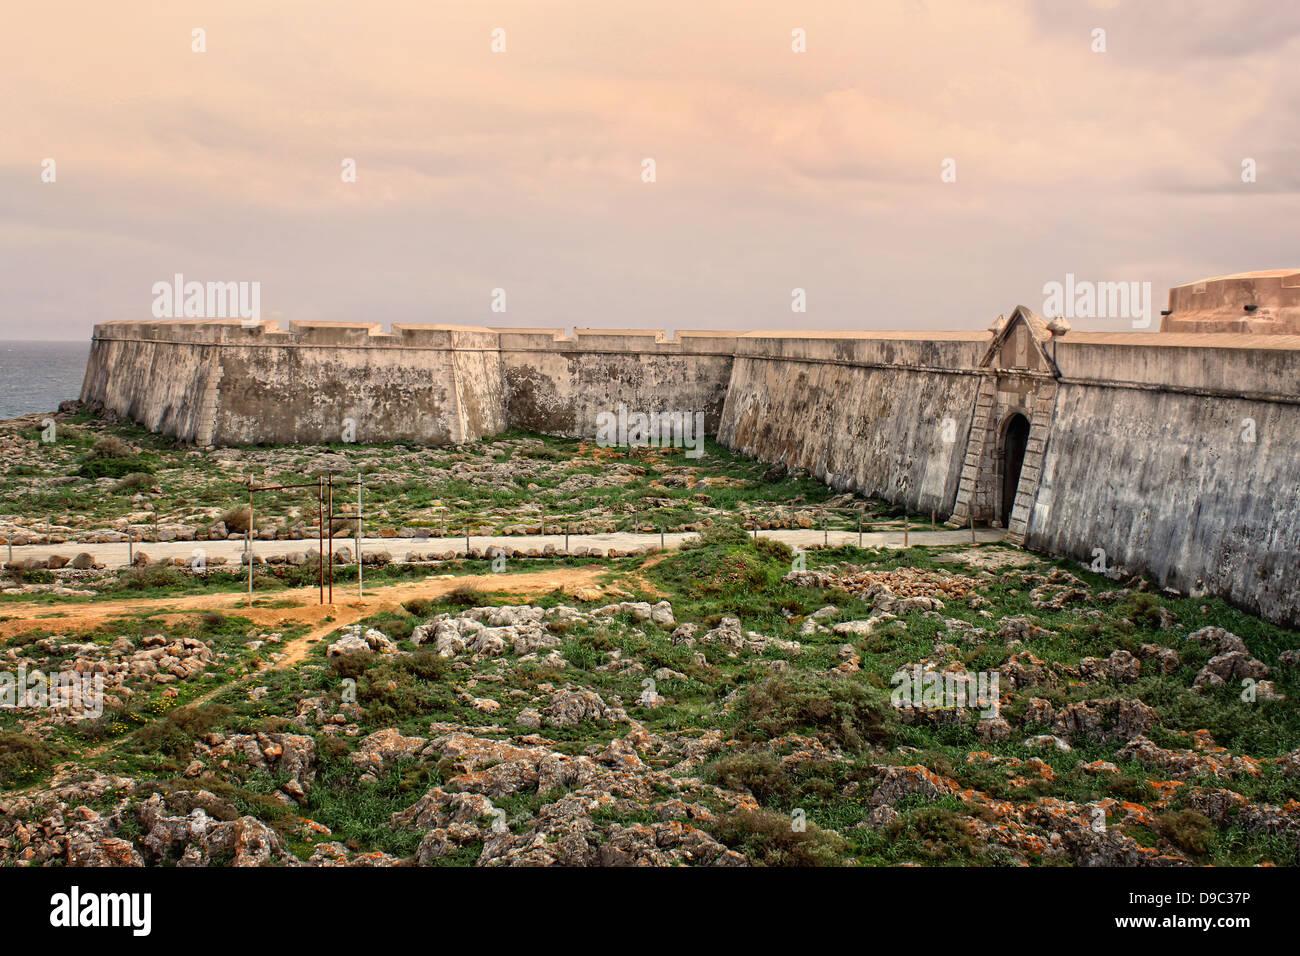 Rugged terrain surround the fortress in Ponta de Sagres, Algarve, Portugal - Stock Image